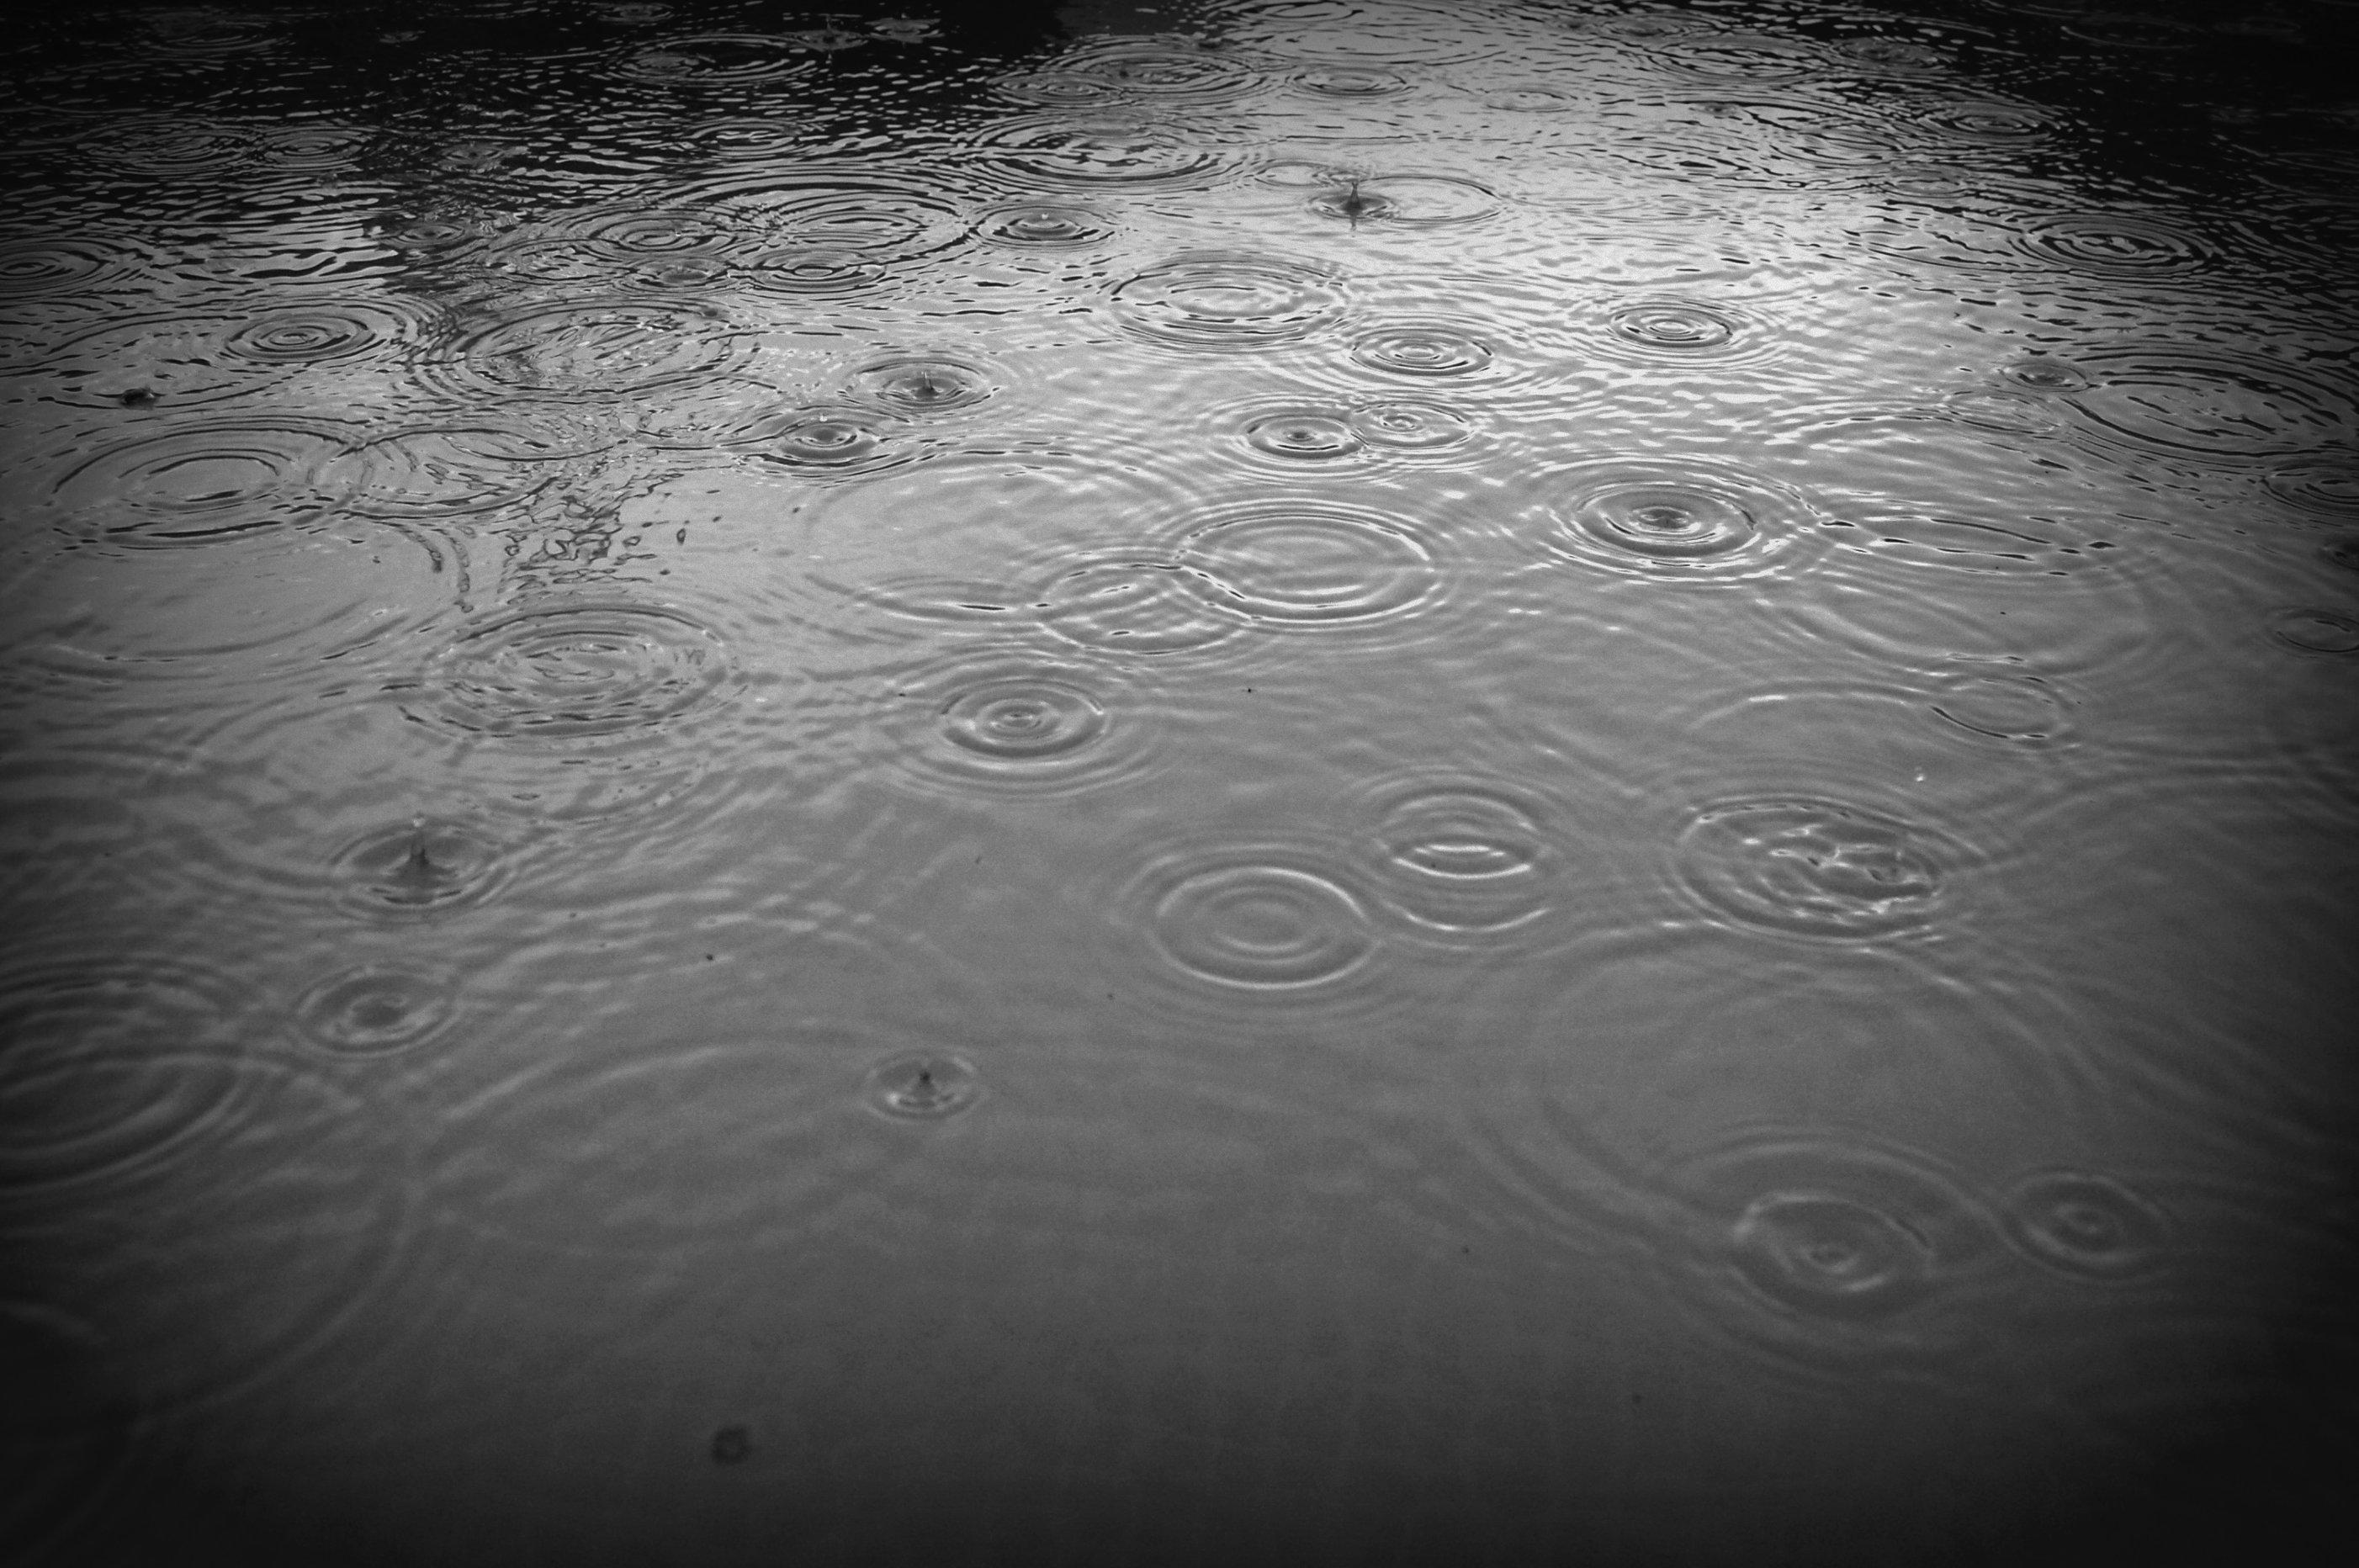 Meanwhile Outside, It's Raining via @theMagunga